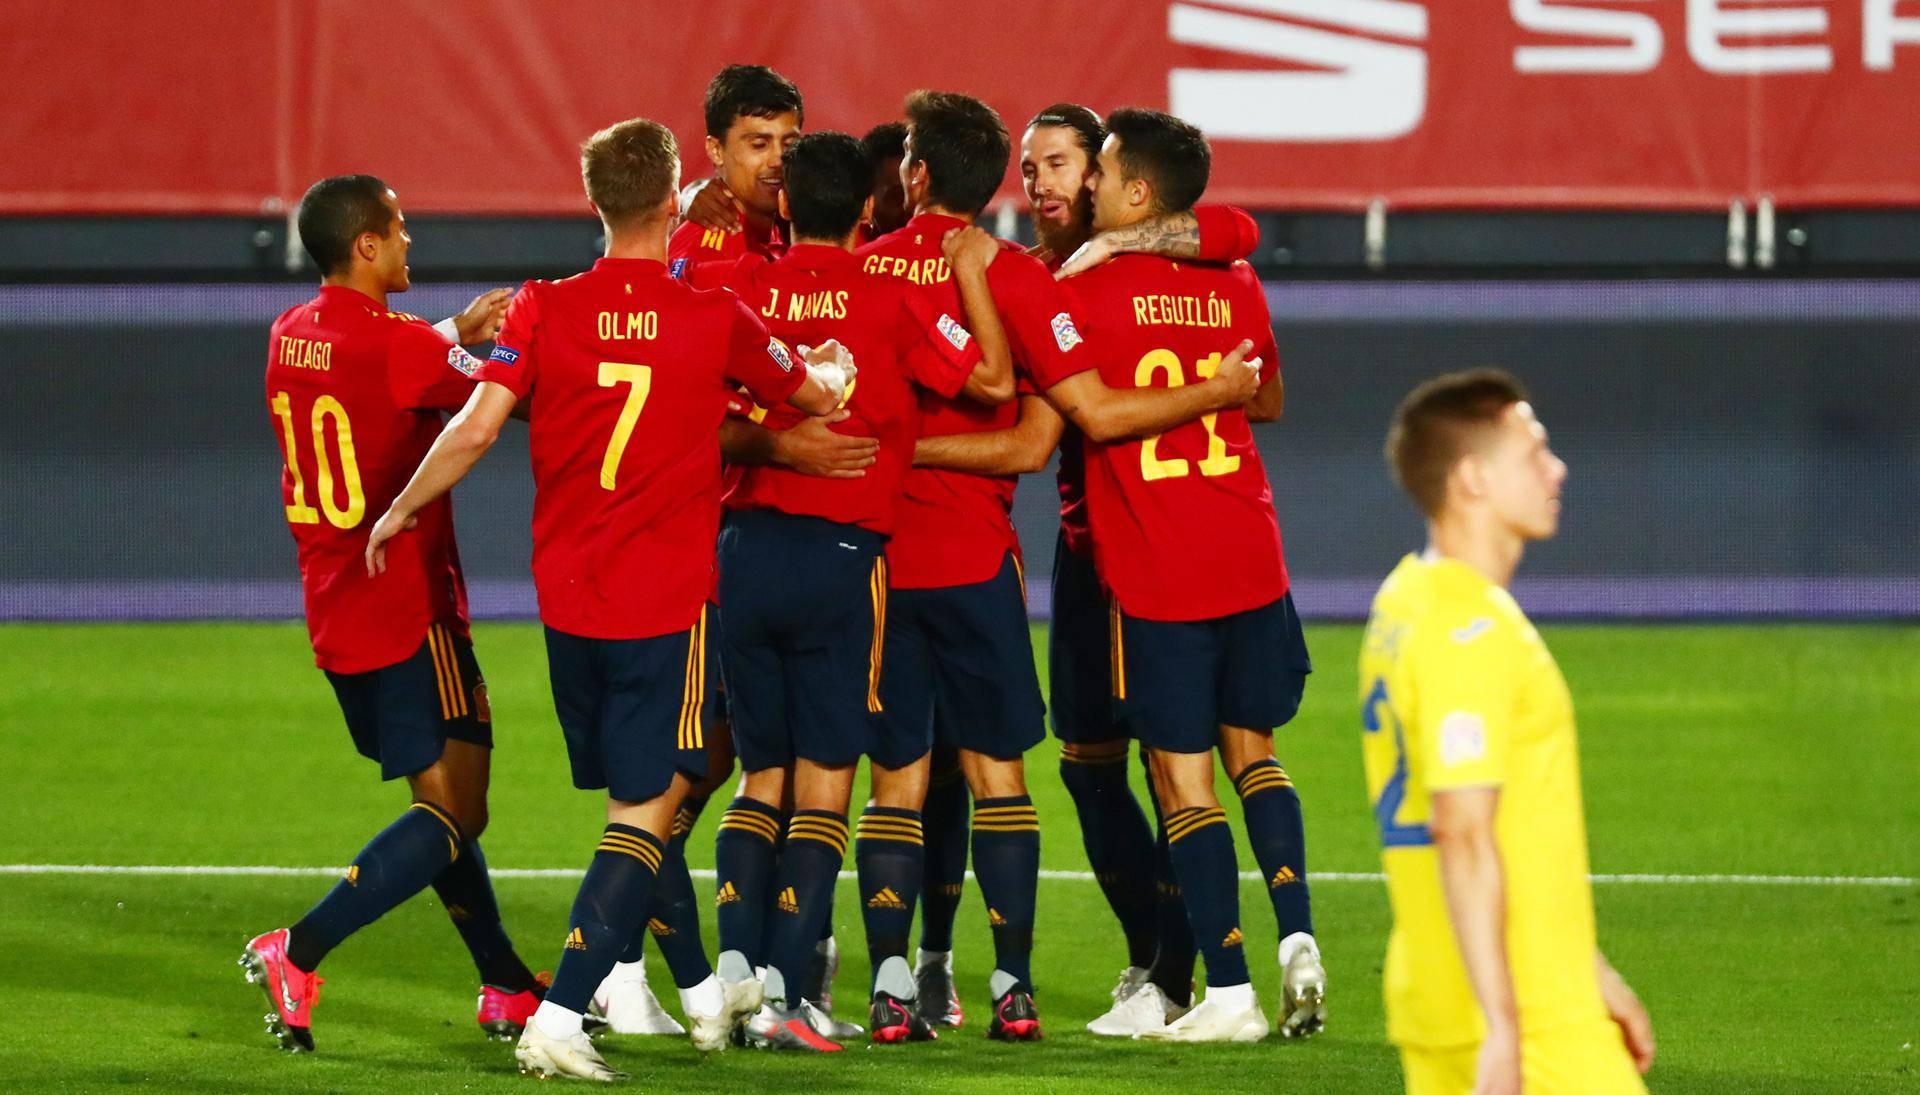 UEFA Nations League - League A - Group 4 - Spain v Ukraine